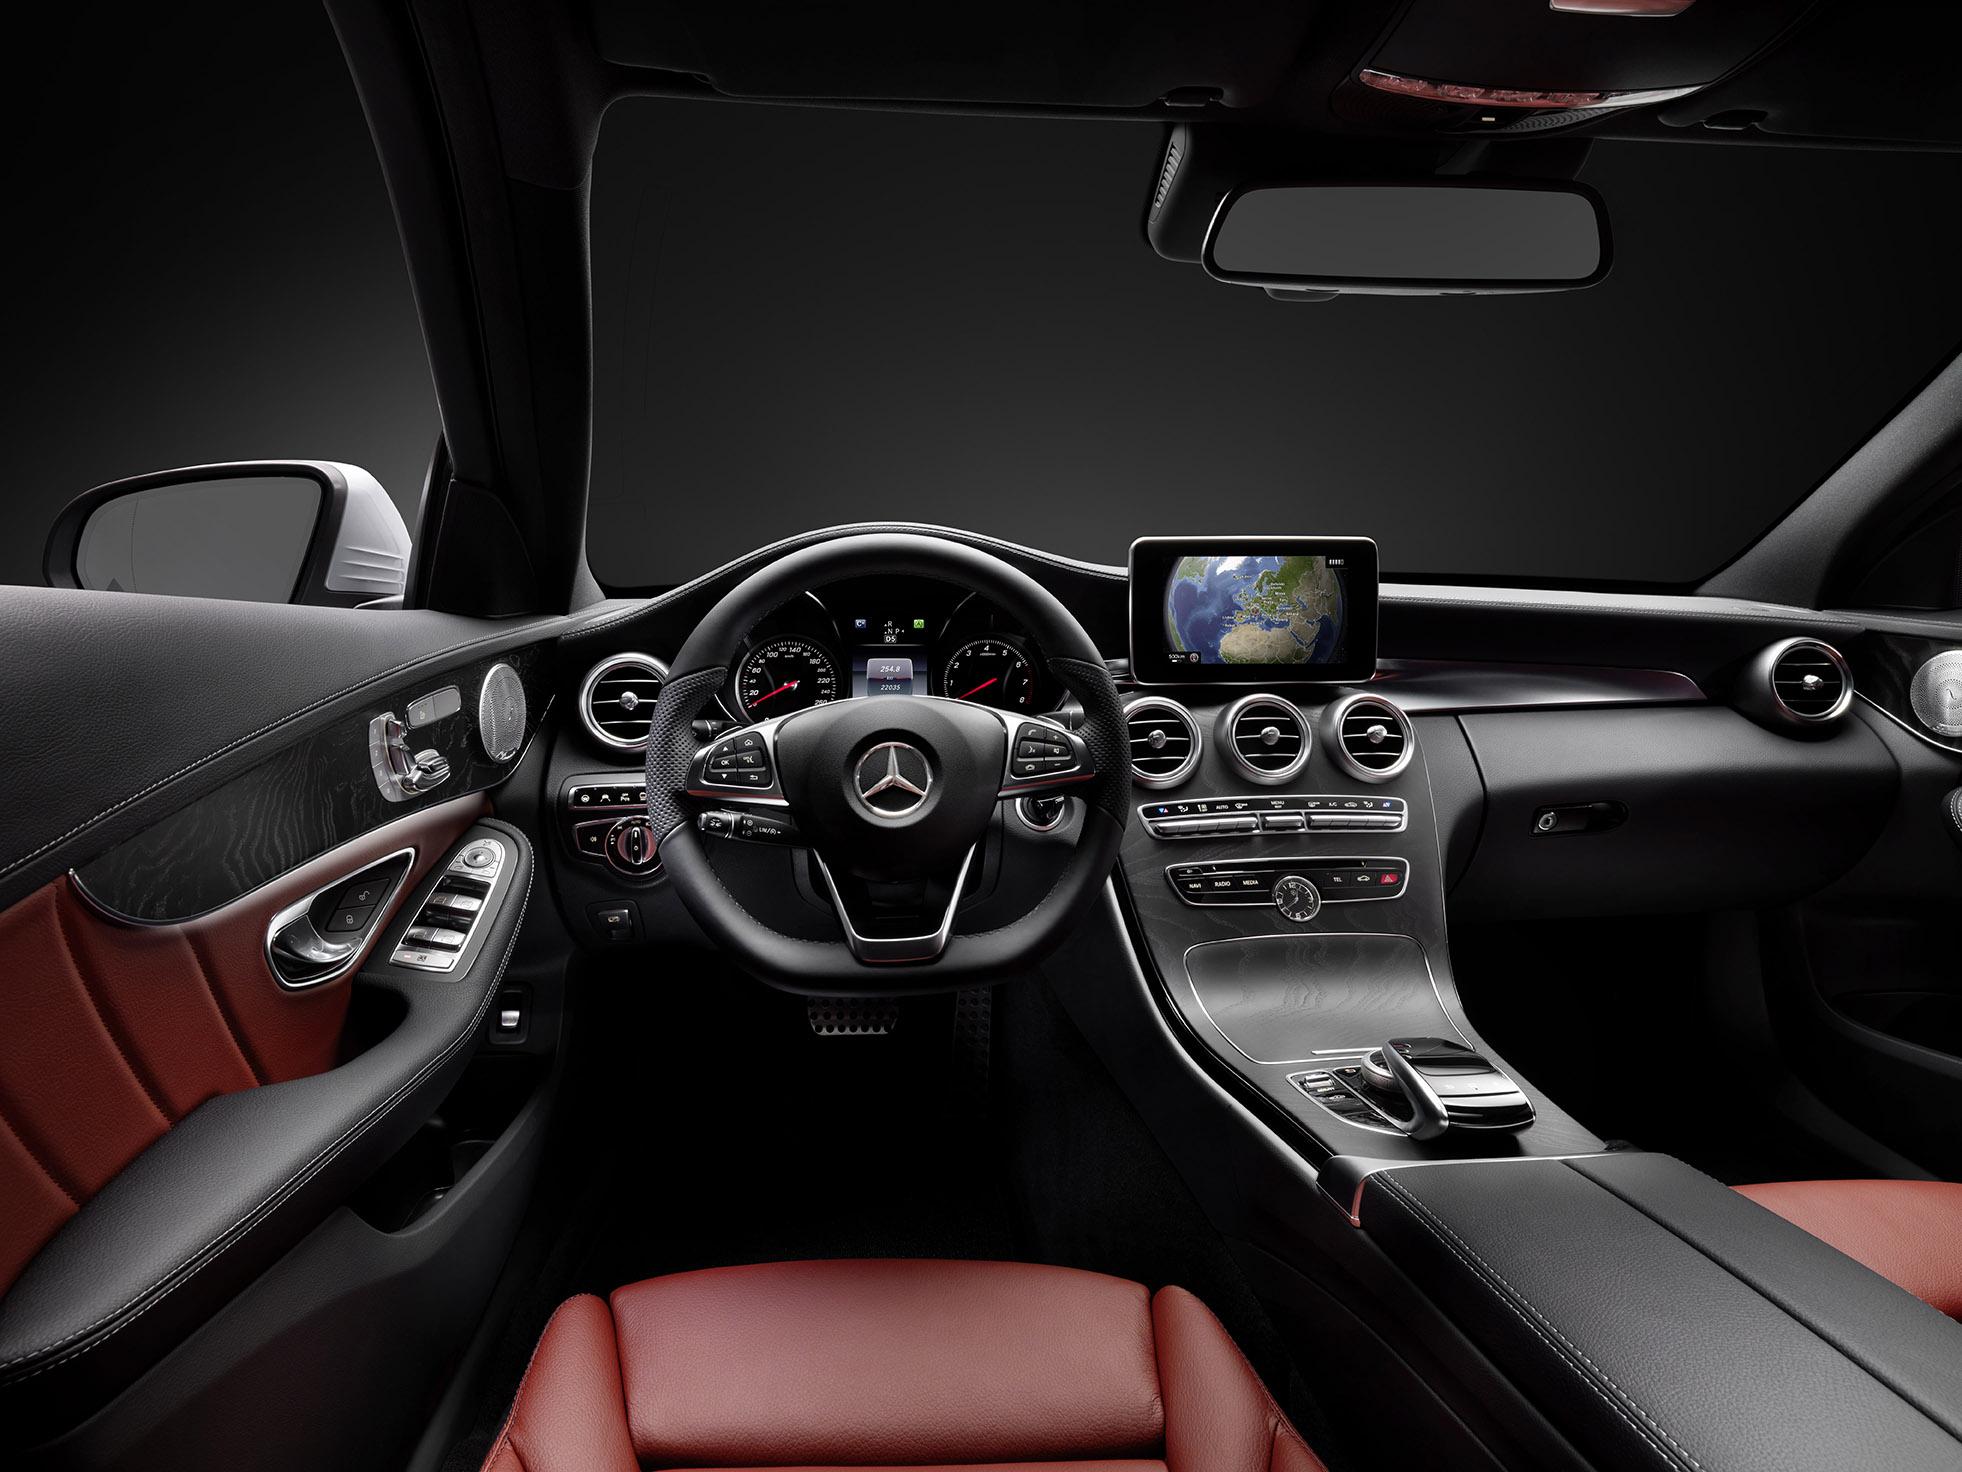 Neue Mercedes C-Klasse (W205) – eine kleine S-Klasse   Autogefühl